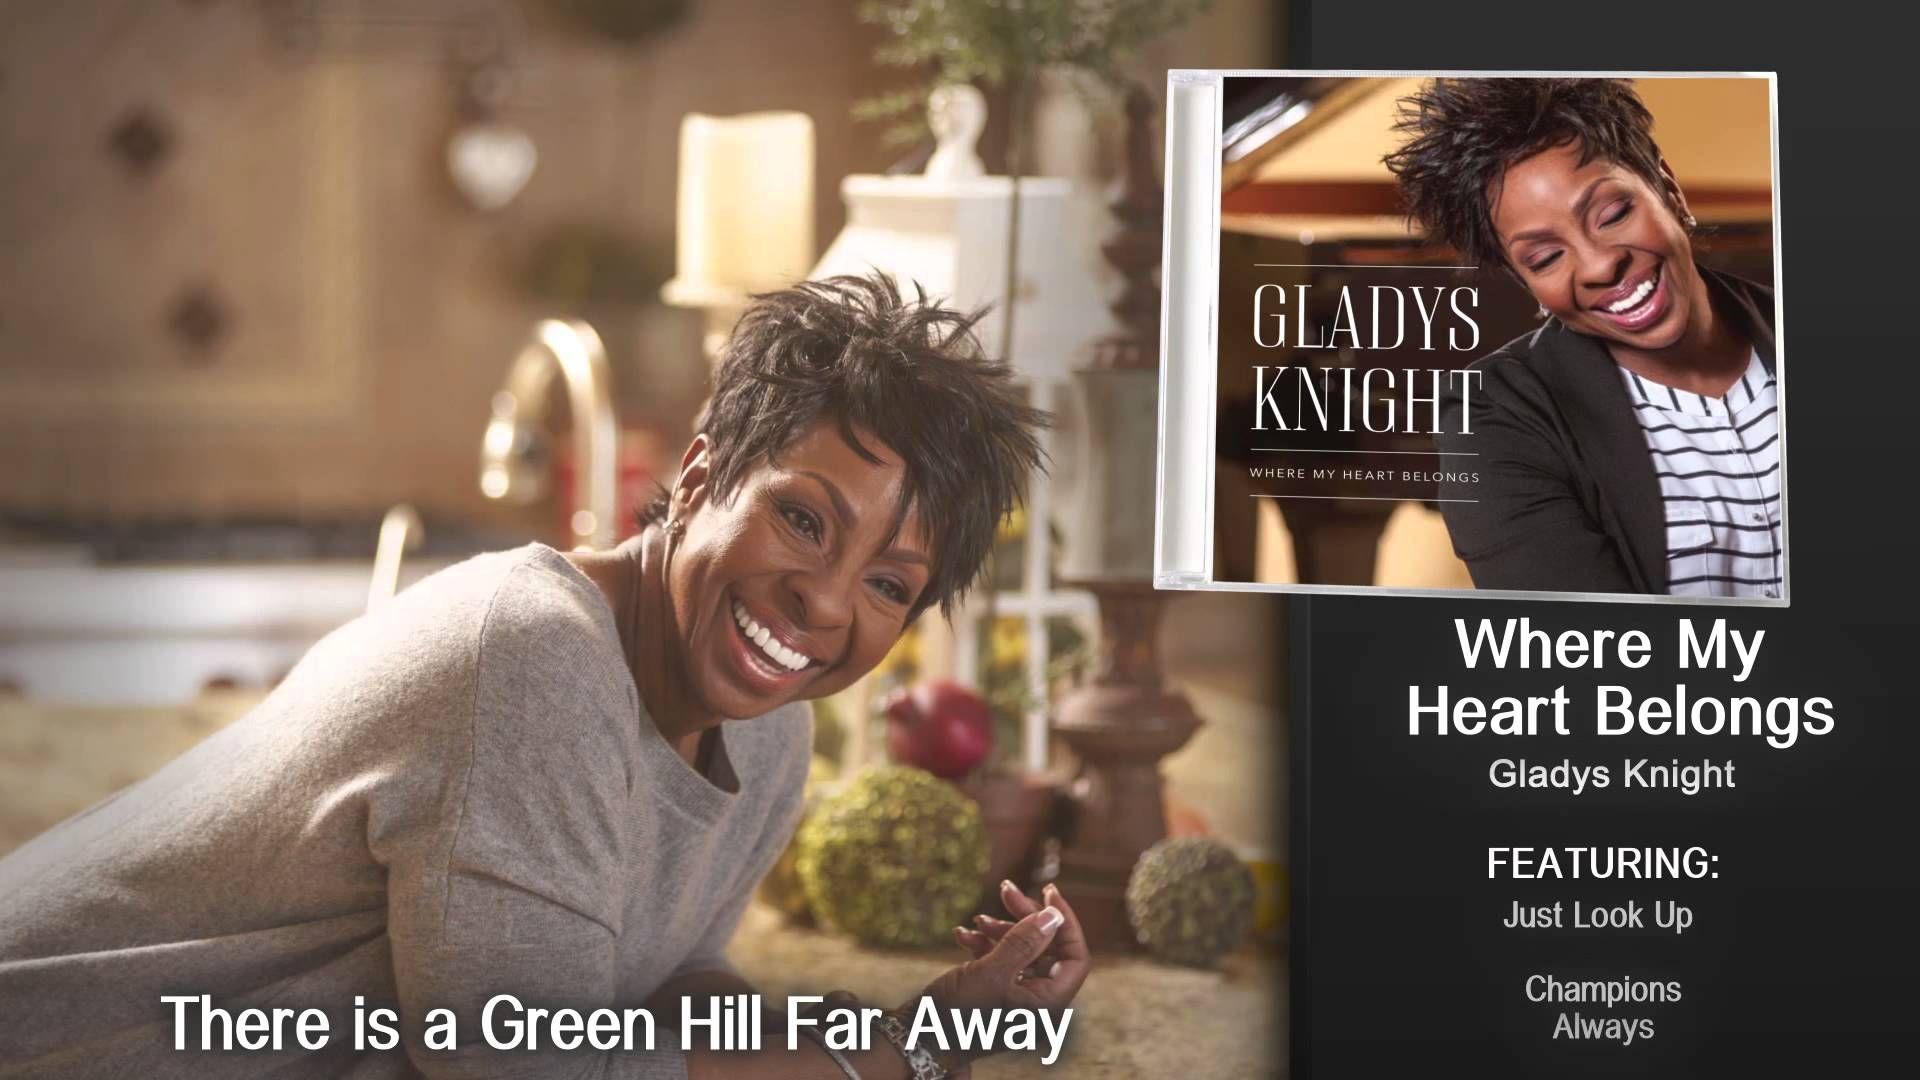 Gladys Knight's NEW album trailer Where My Heart Belongs